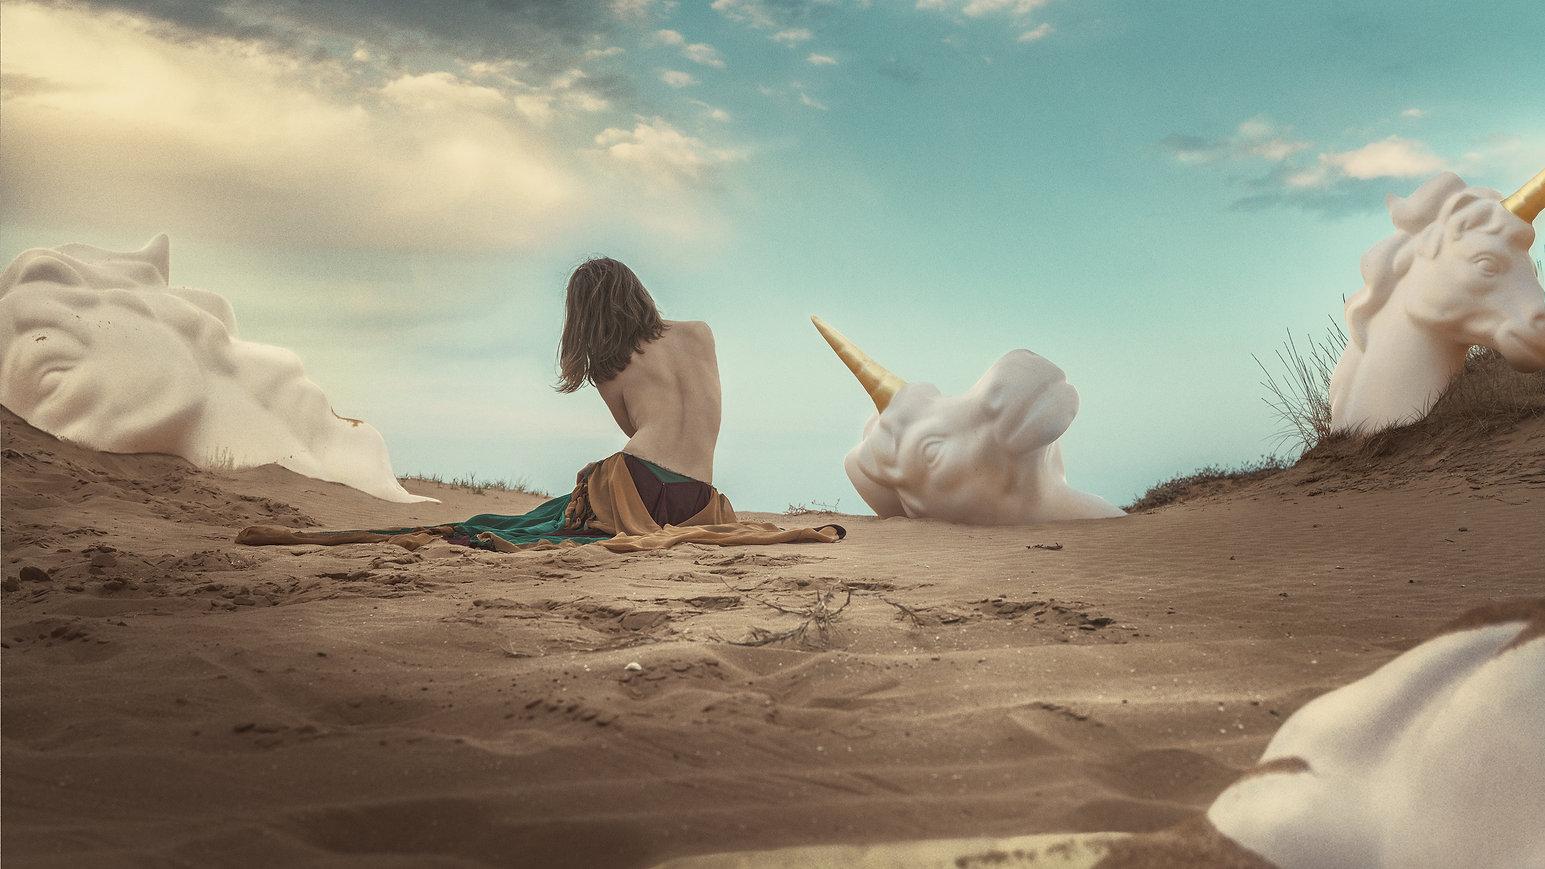 Mati-Gelman-My-Dreams-In-Dunes-Fine-Art-